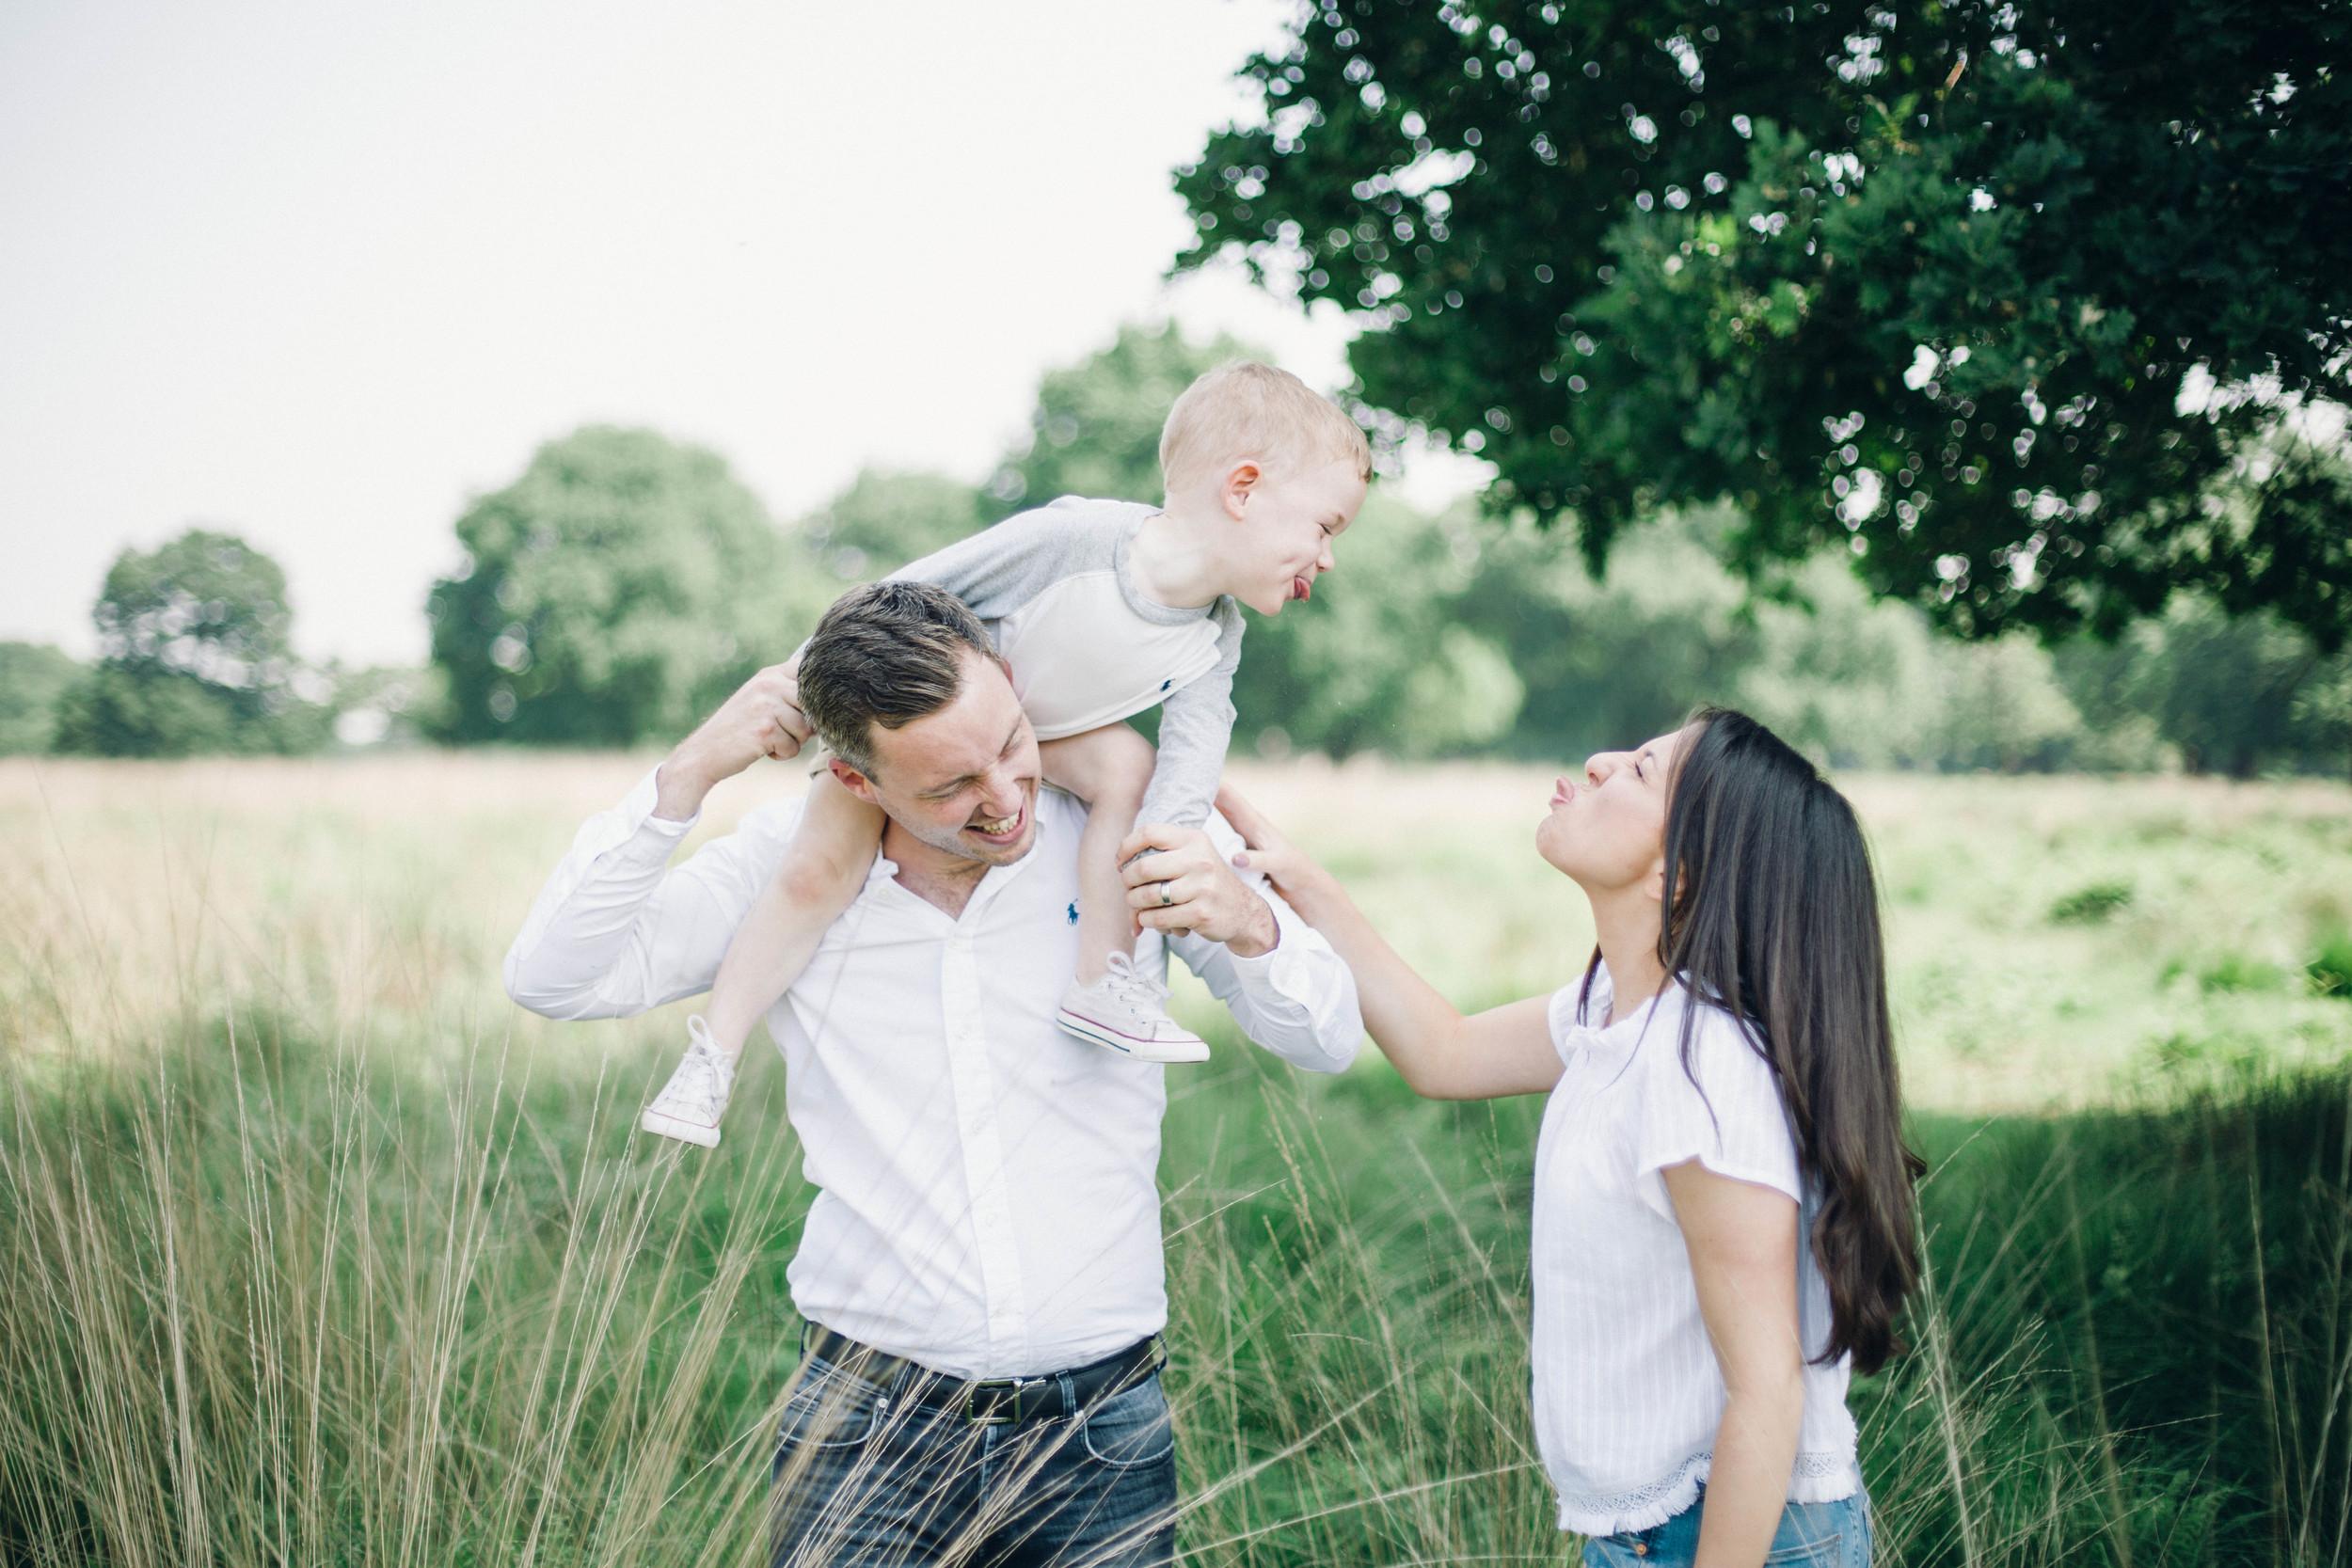 Lelya_LittleKinPhotography_family_photoshoot_Richmond-103.jpg